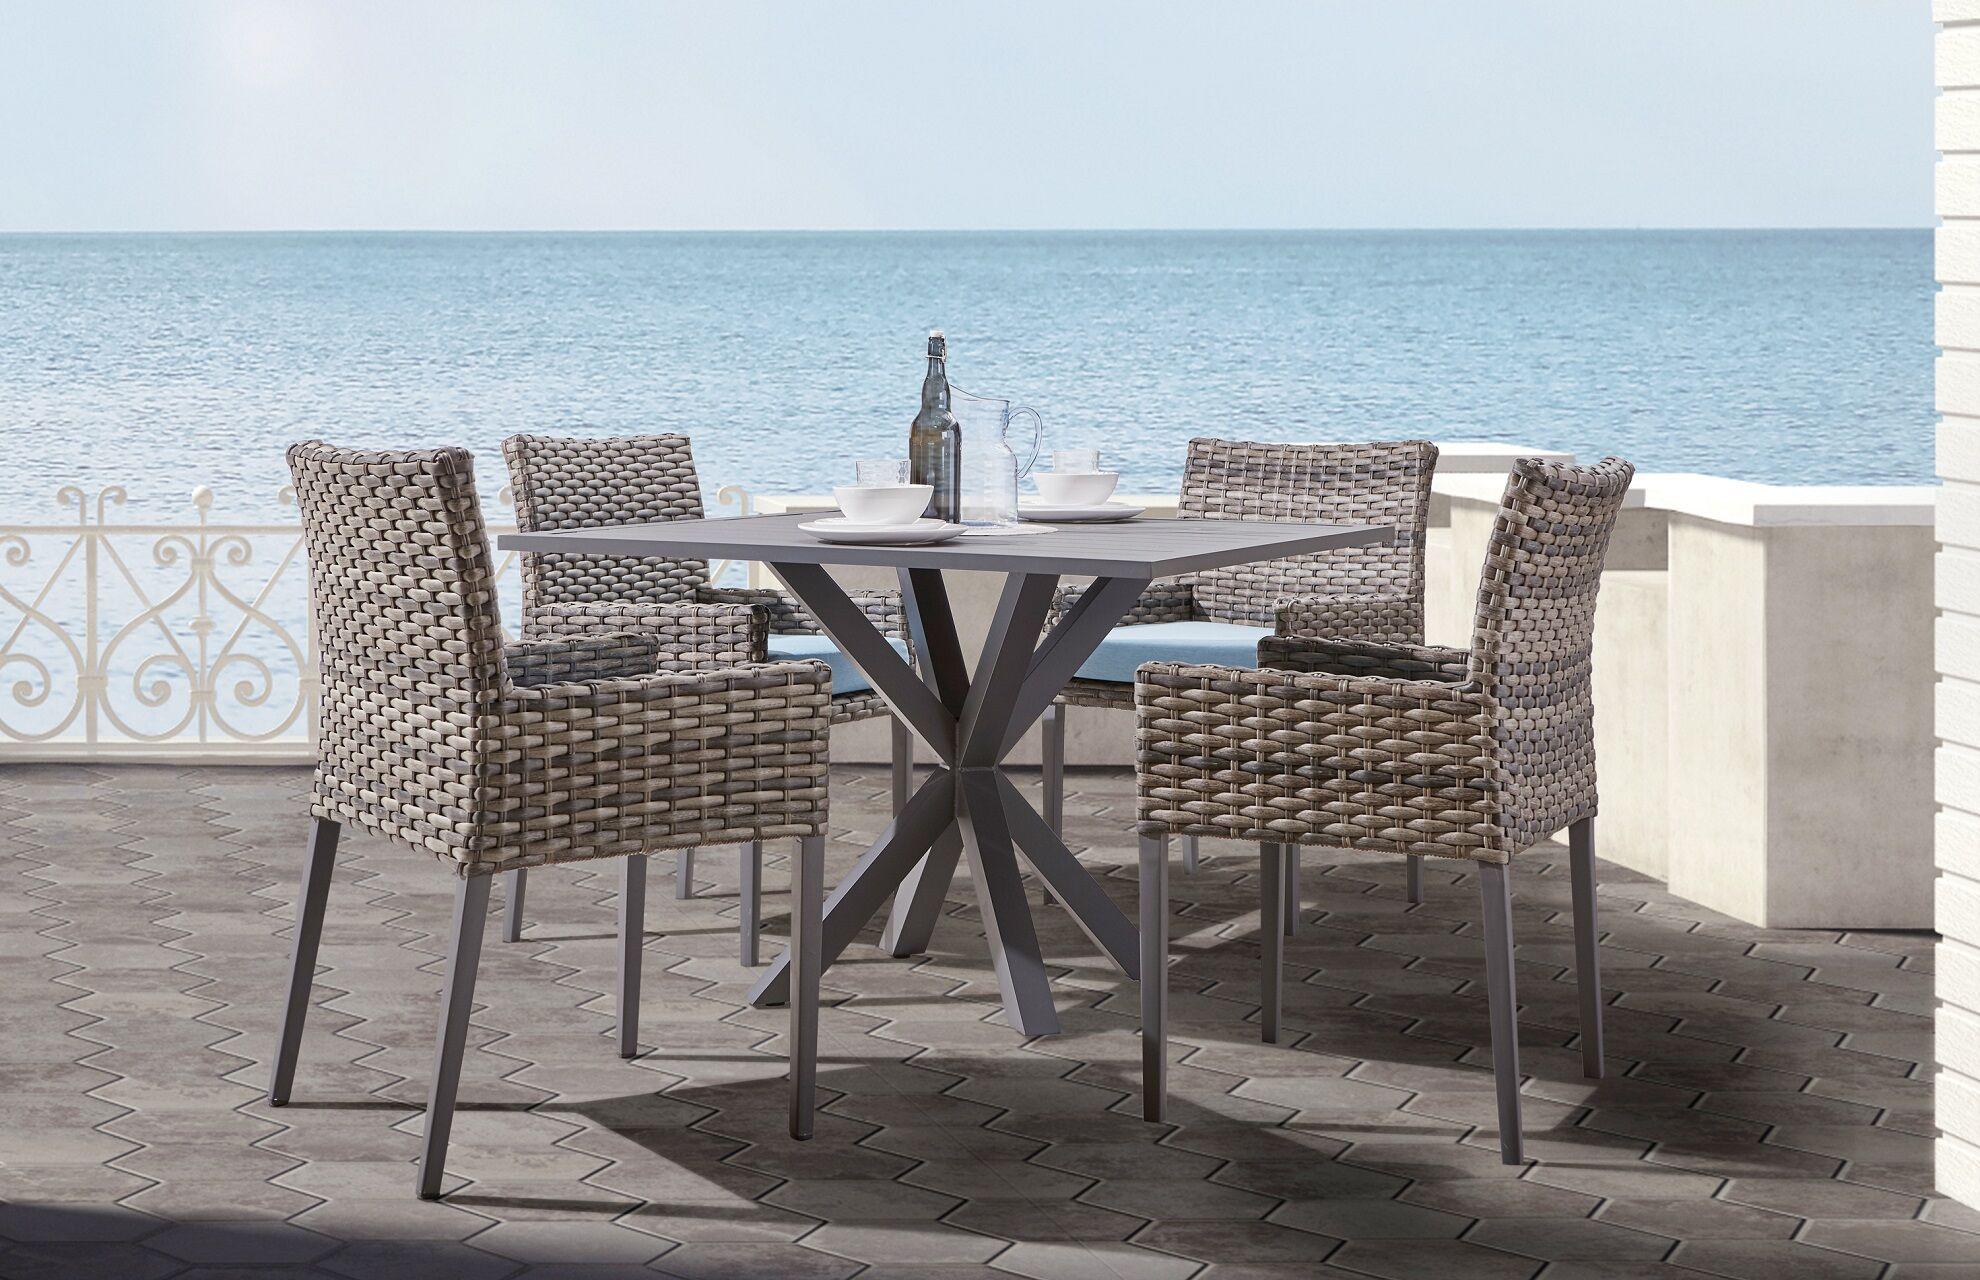 Doyle 5 Piece Sunbrella Patio Dining Set with Cushions Cushion Color: Canvas Aquamarine